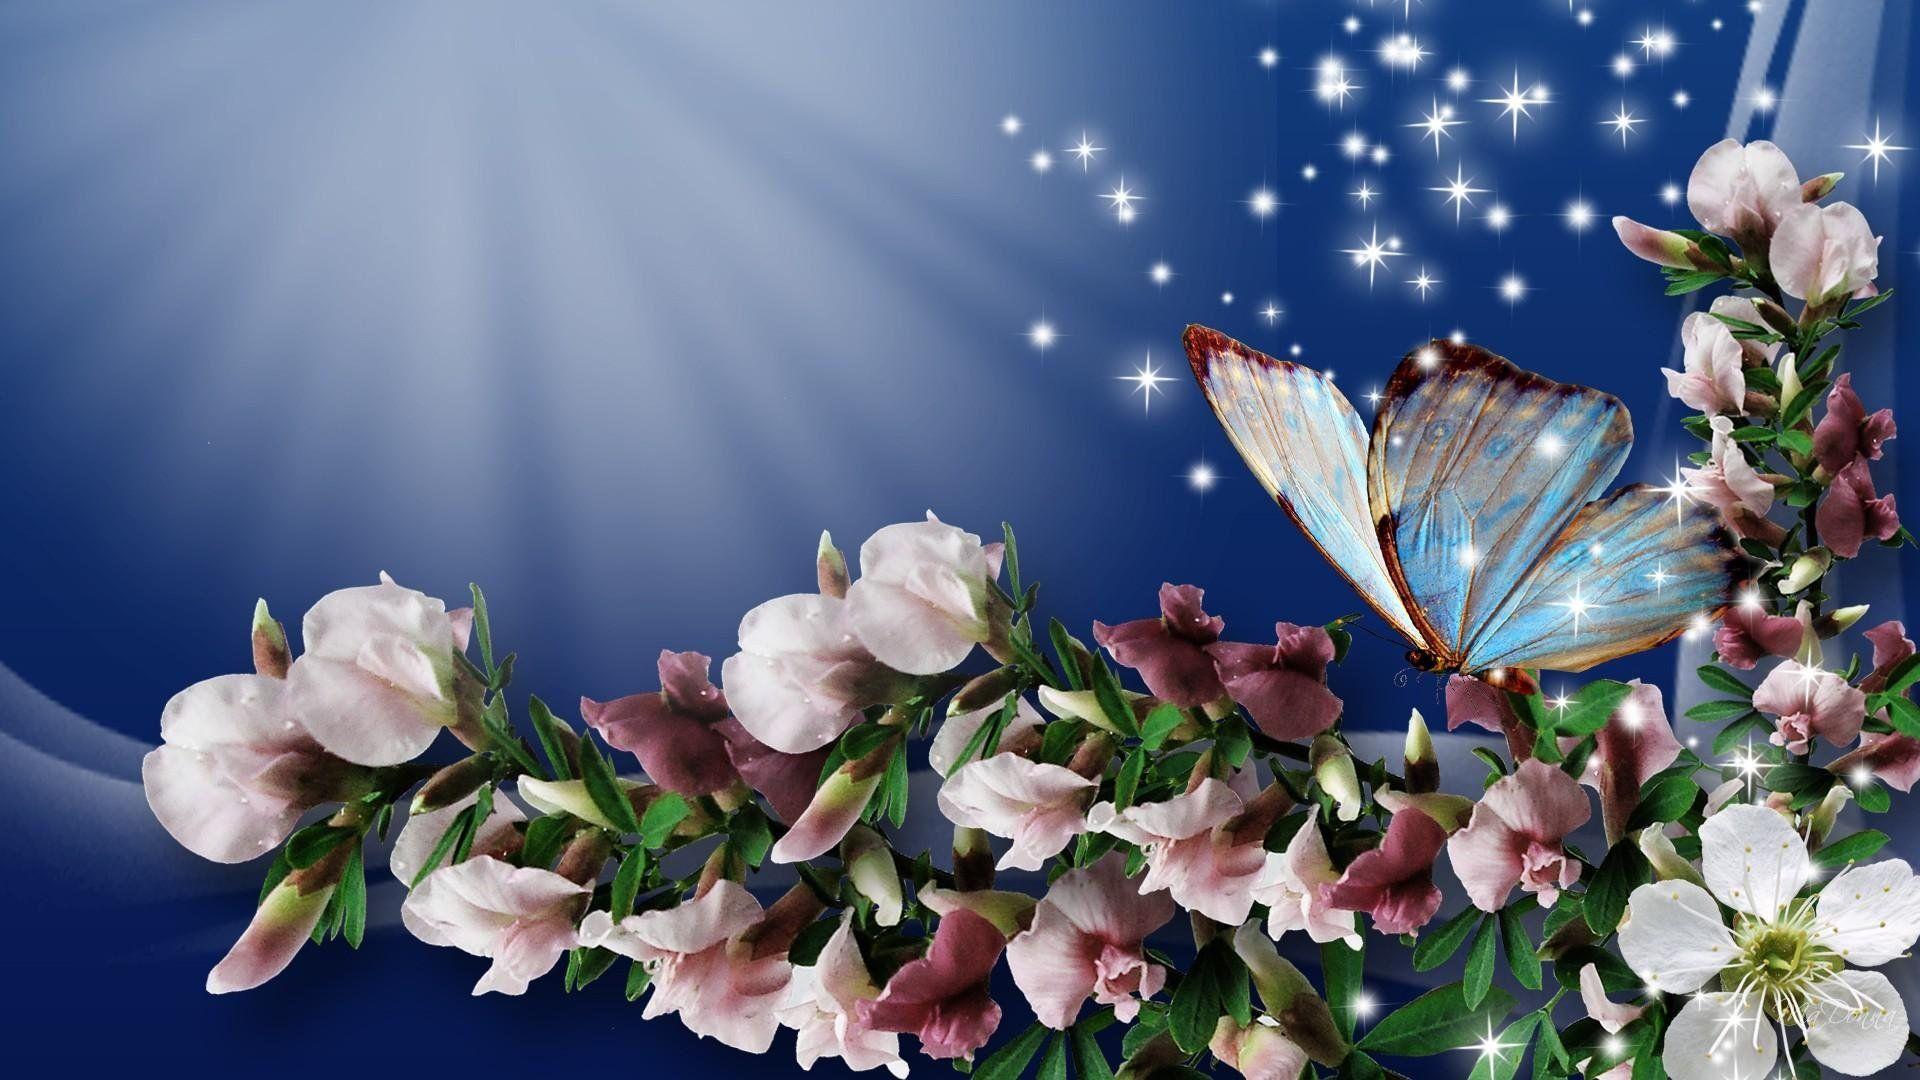 Hd wallpaper spring - Spring Flowers Wallpaper Hd Natures Wallpapers Pinterest